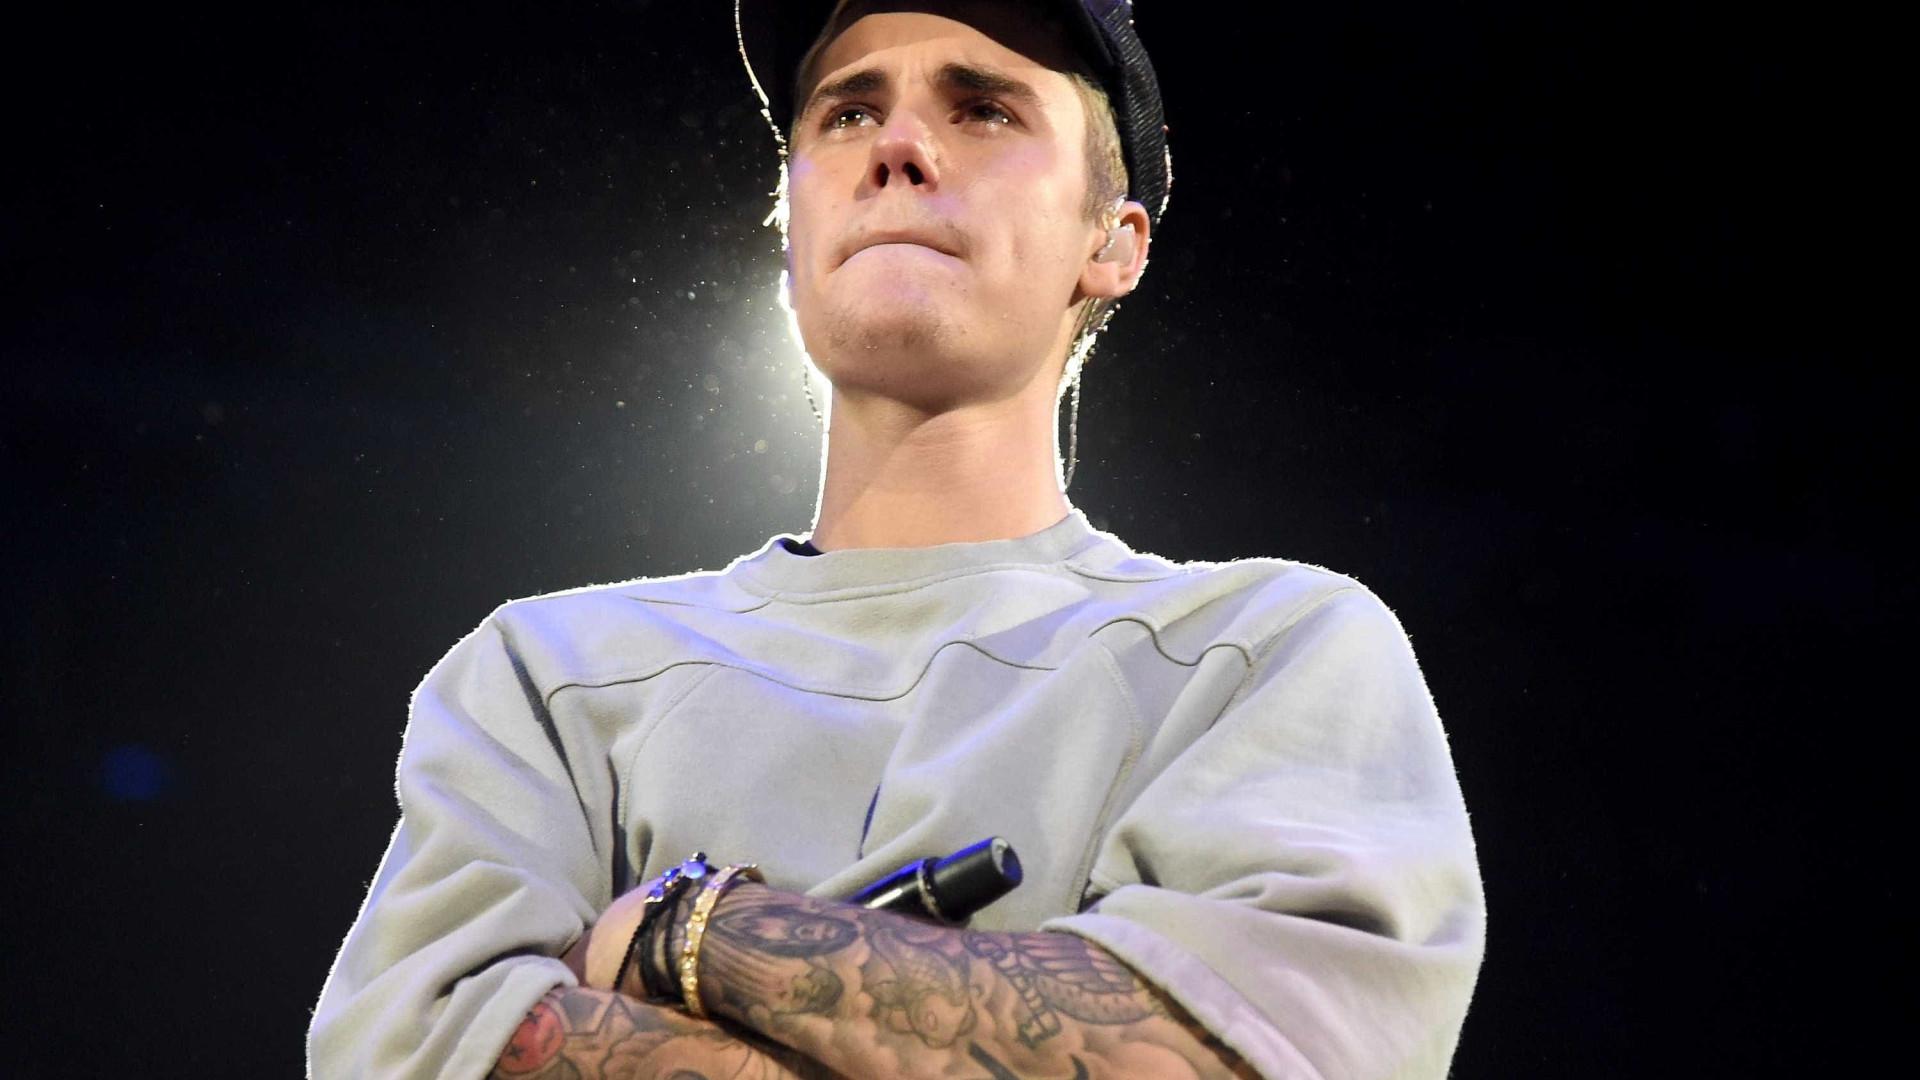 Justin Bieber aproveita a Páscoa para lança EP gospel de surpresa